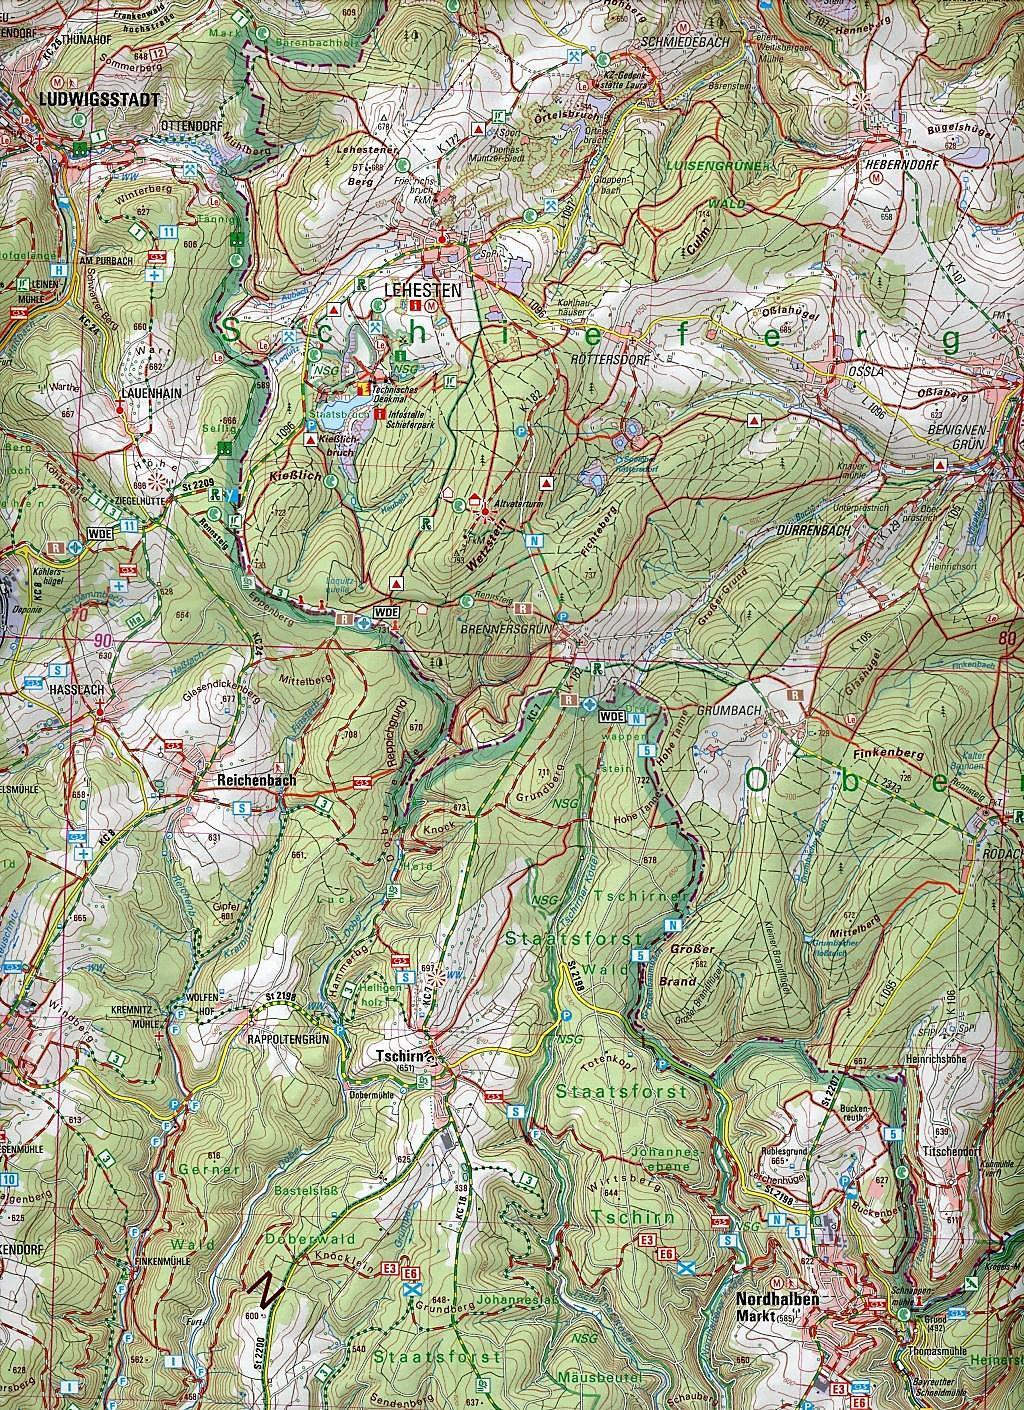 Topographische Karte Bayern.Topographische Karte Bayern Naturpark Frankenwald Buch Weltbild De